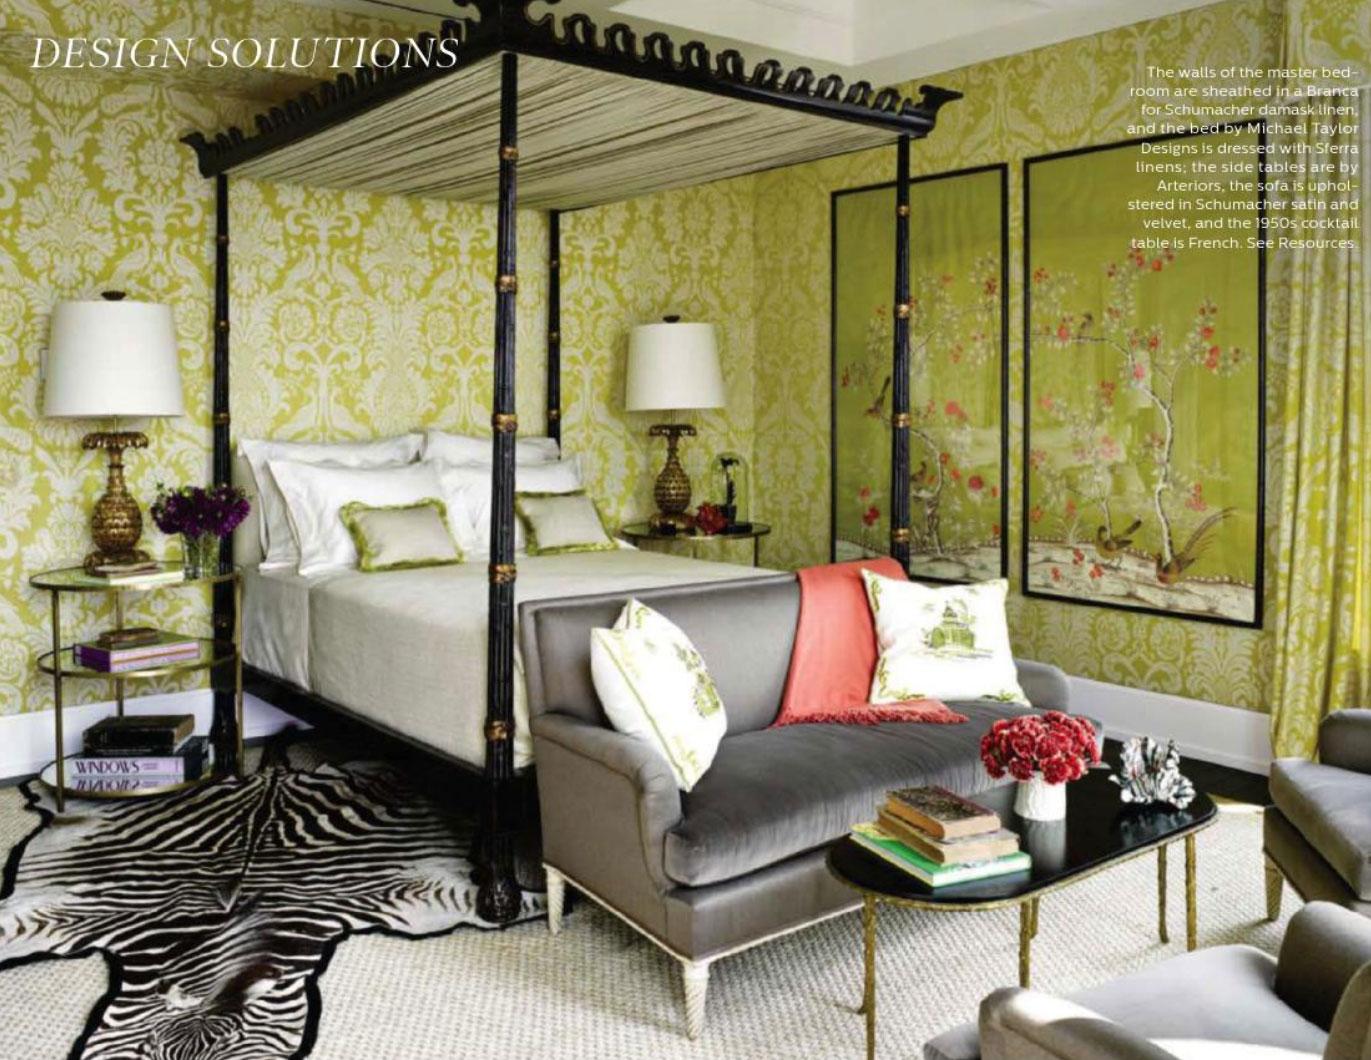 Branca For Schumacher Damask Linen Interiors By Color